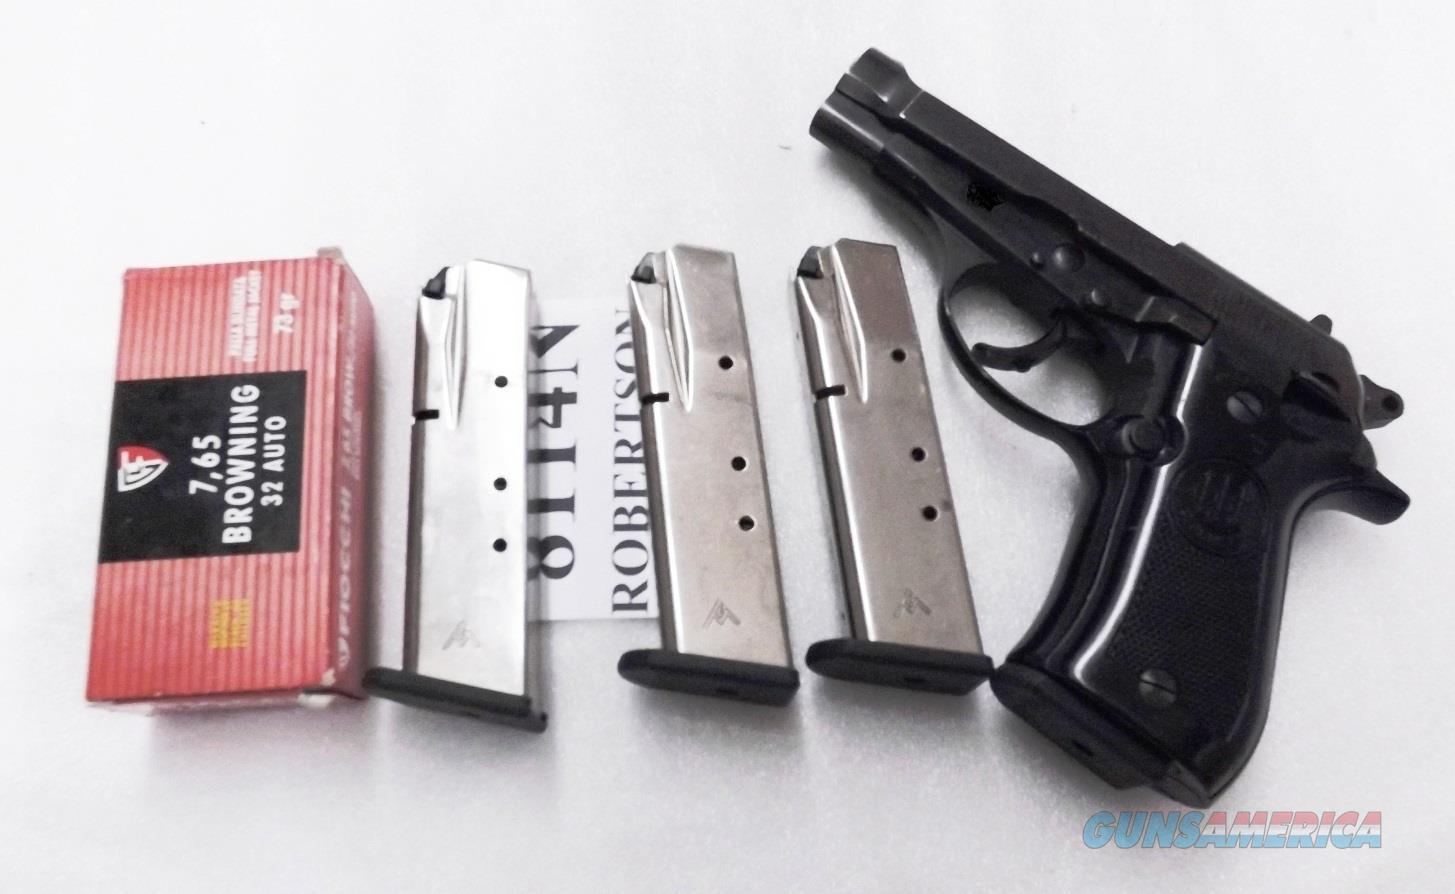 3 Beretta model 81 Cheetah .32 ACP Modified Mec-Gar 14 shot Nickel Magazines C85888 type $29 each Free Ship lower 48  Non-Guns > Magazines & Clips > Pistol Magazines > Beretta